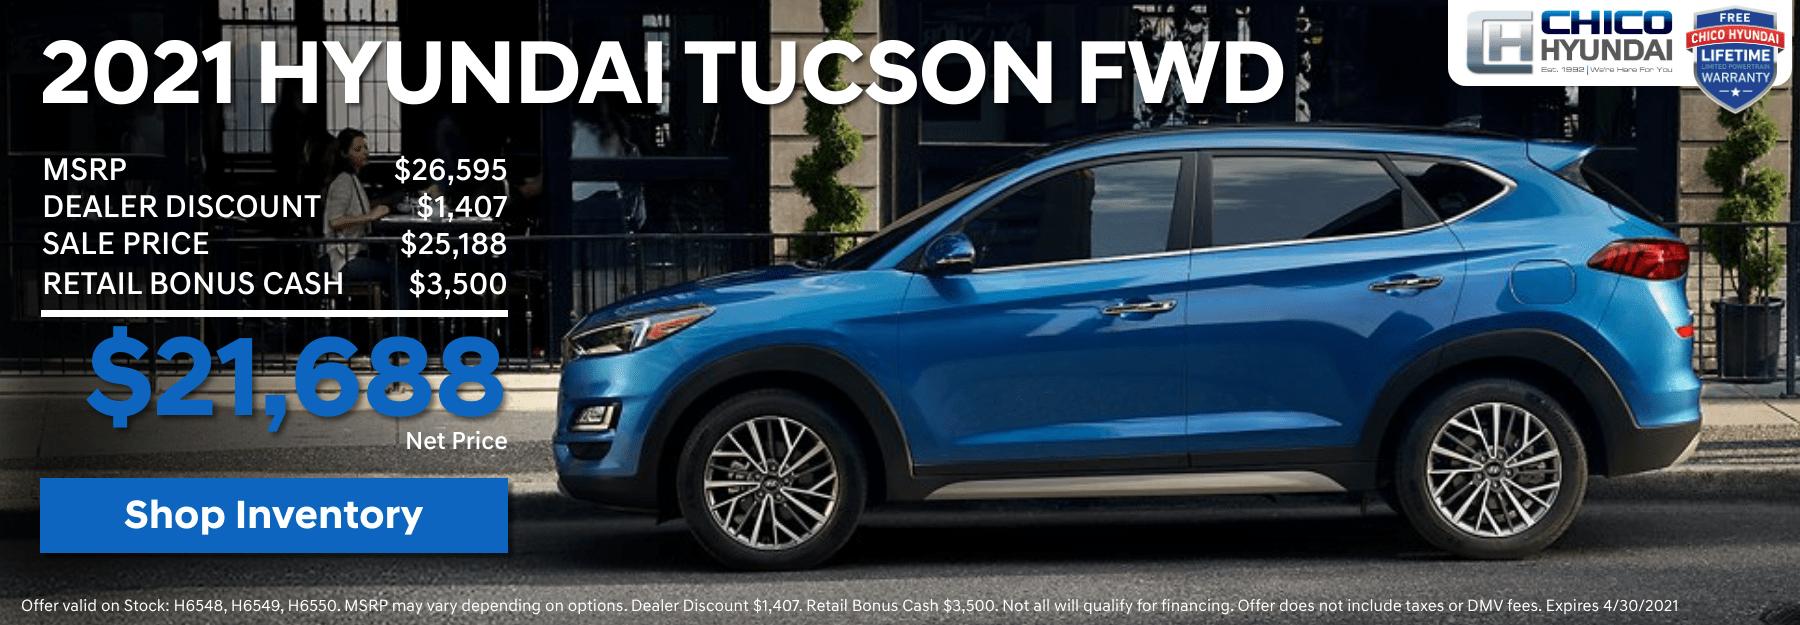 Tucson Discount-1800x625px